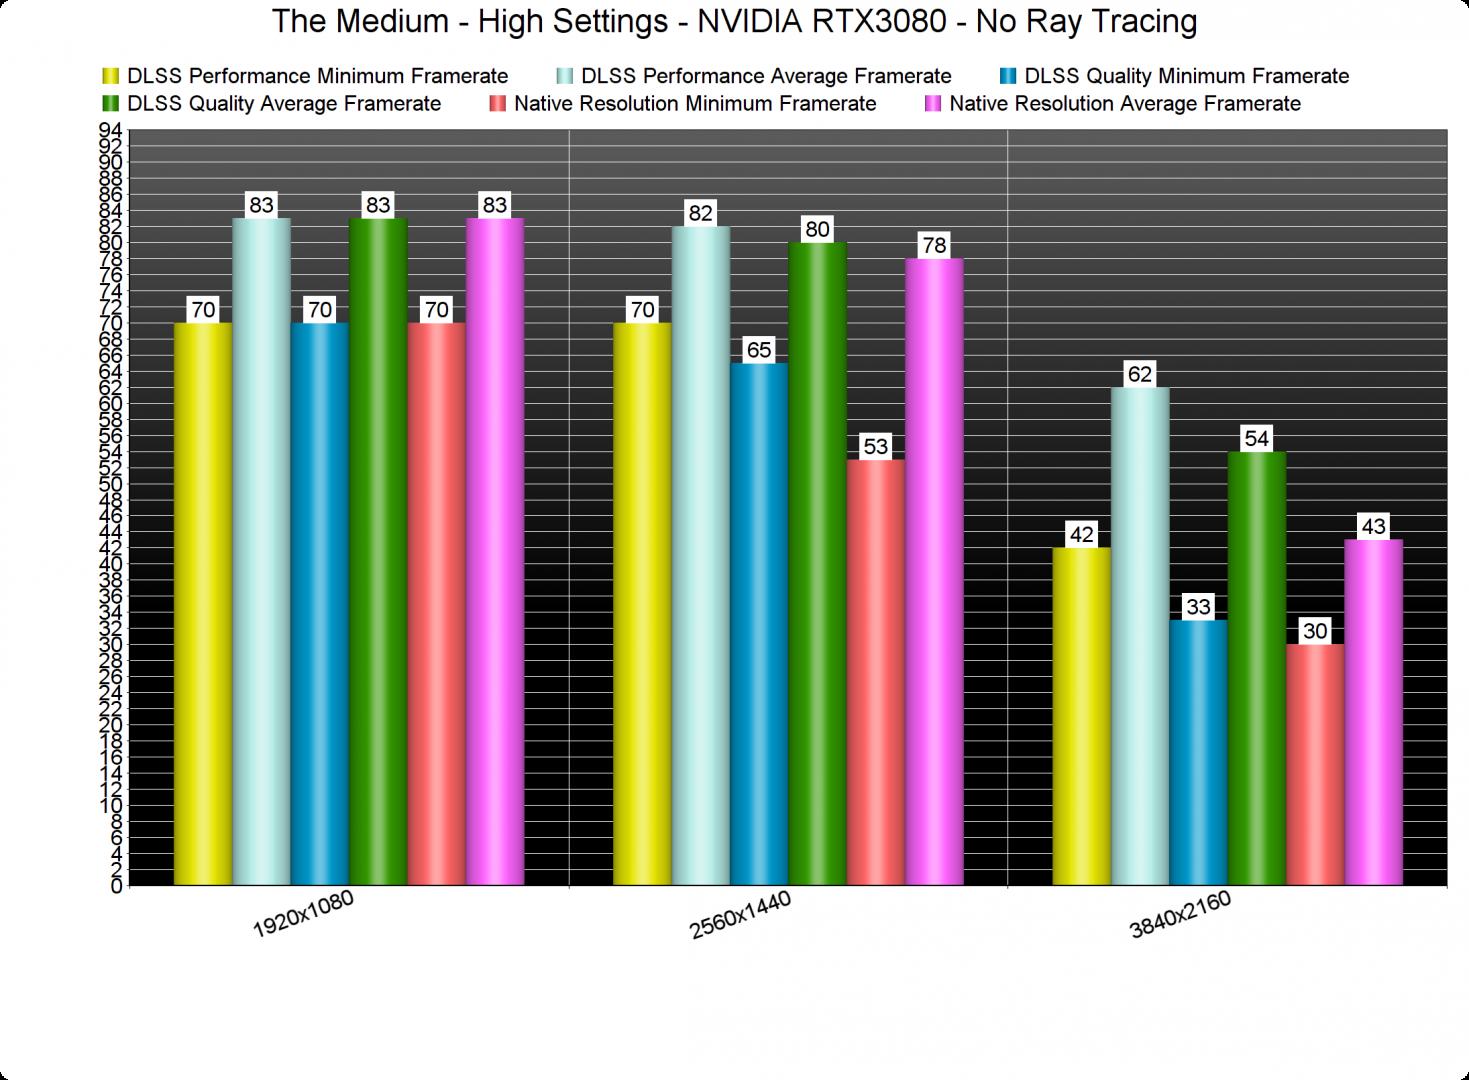 The Medium DLSS benchmarks